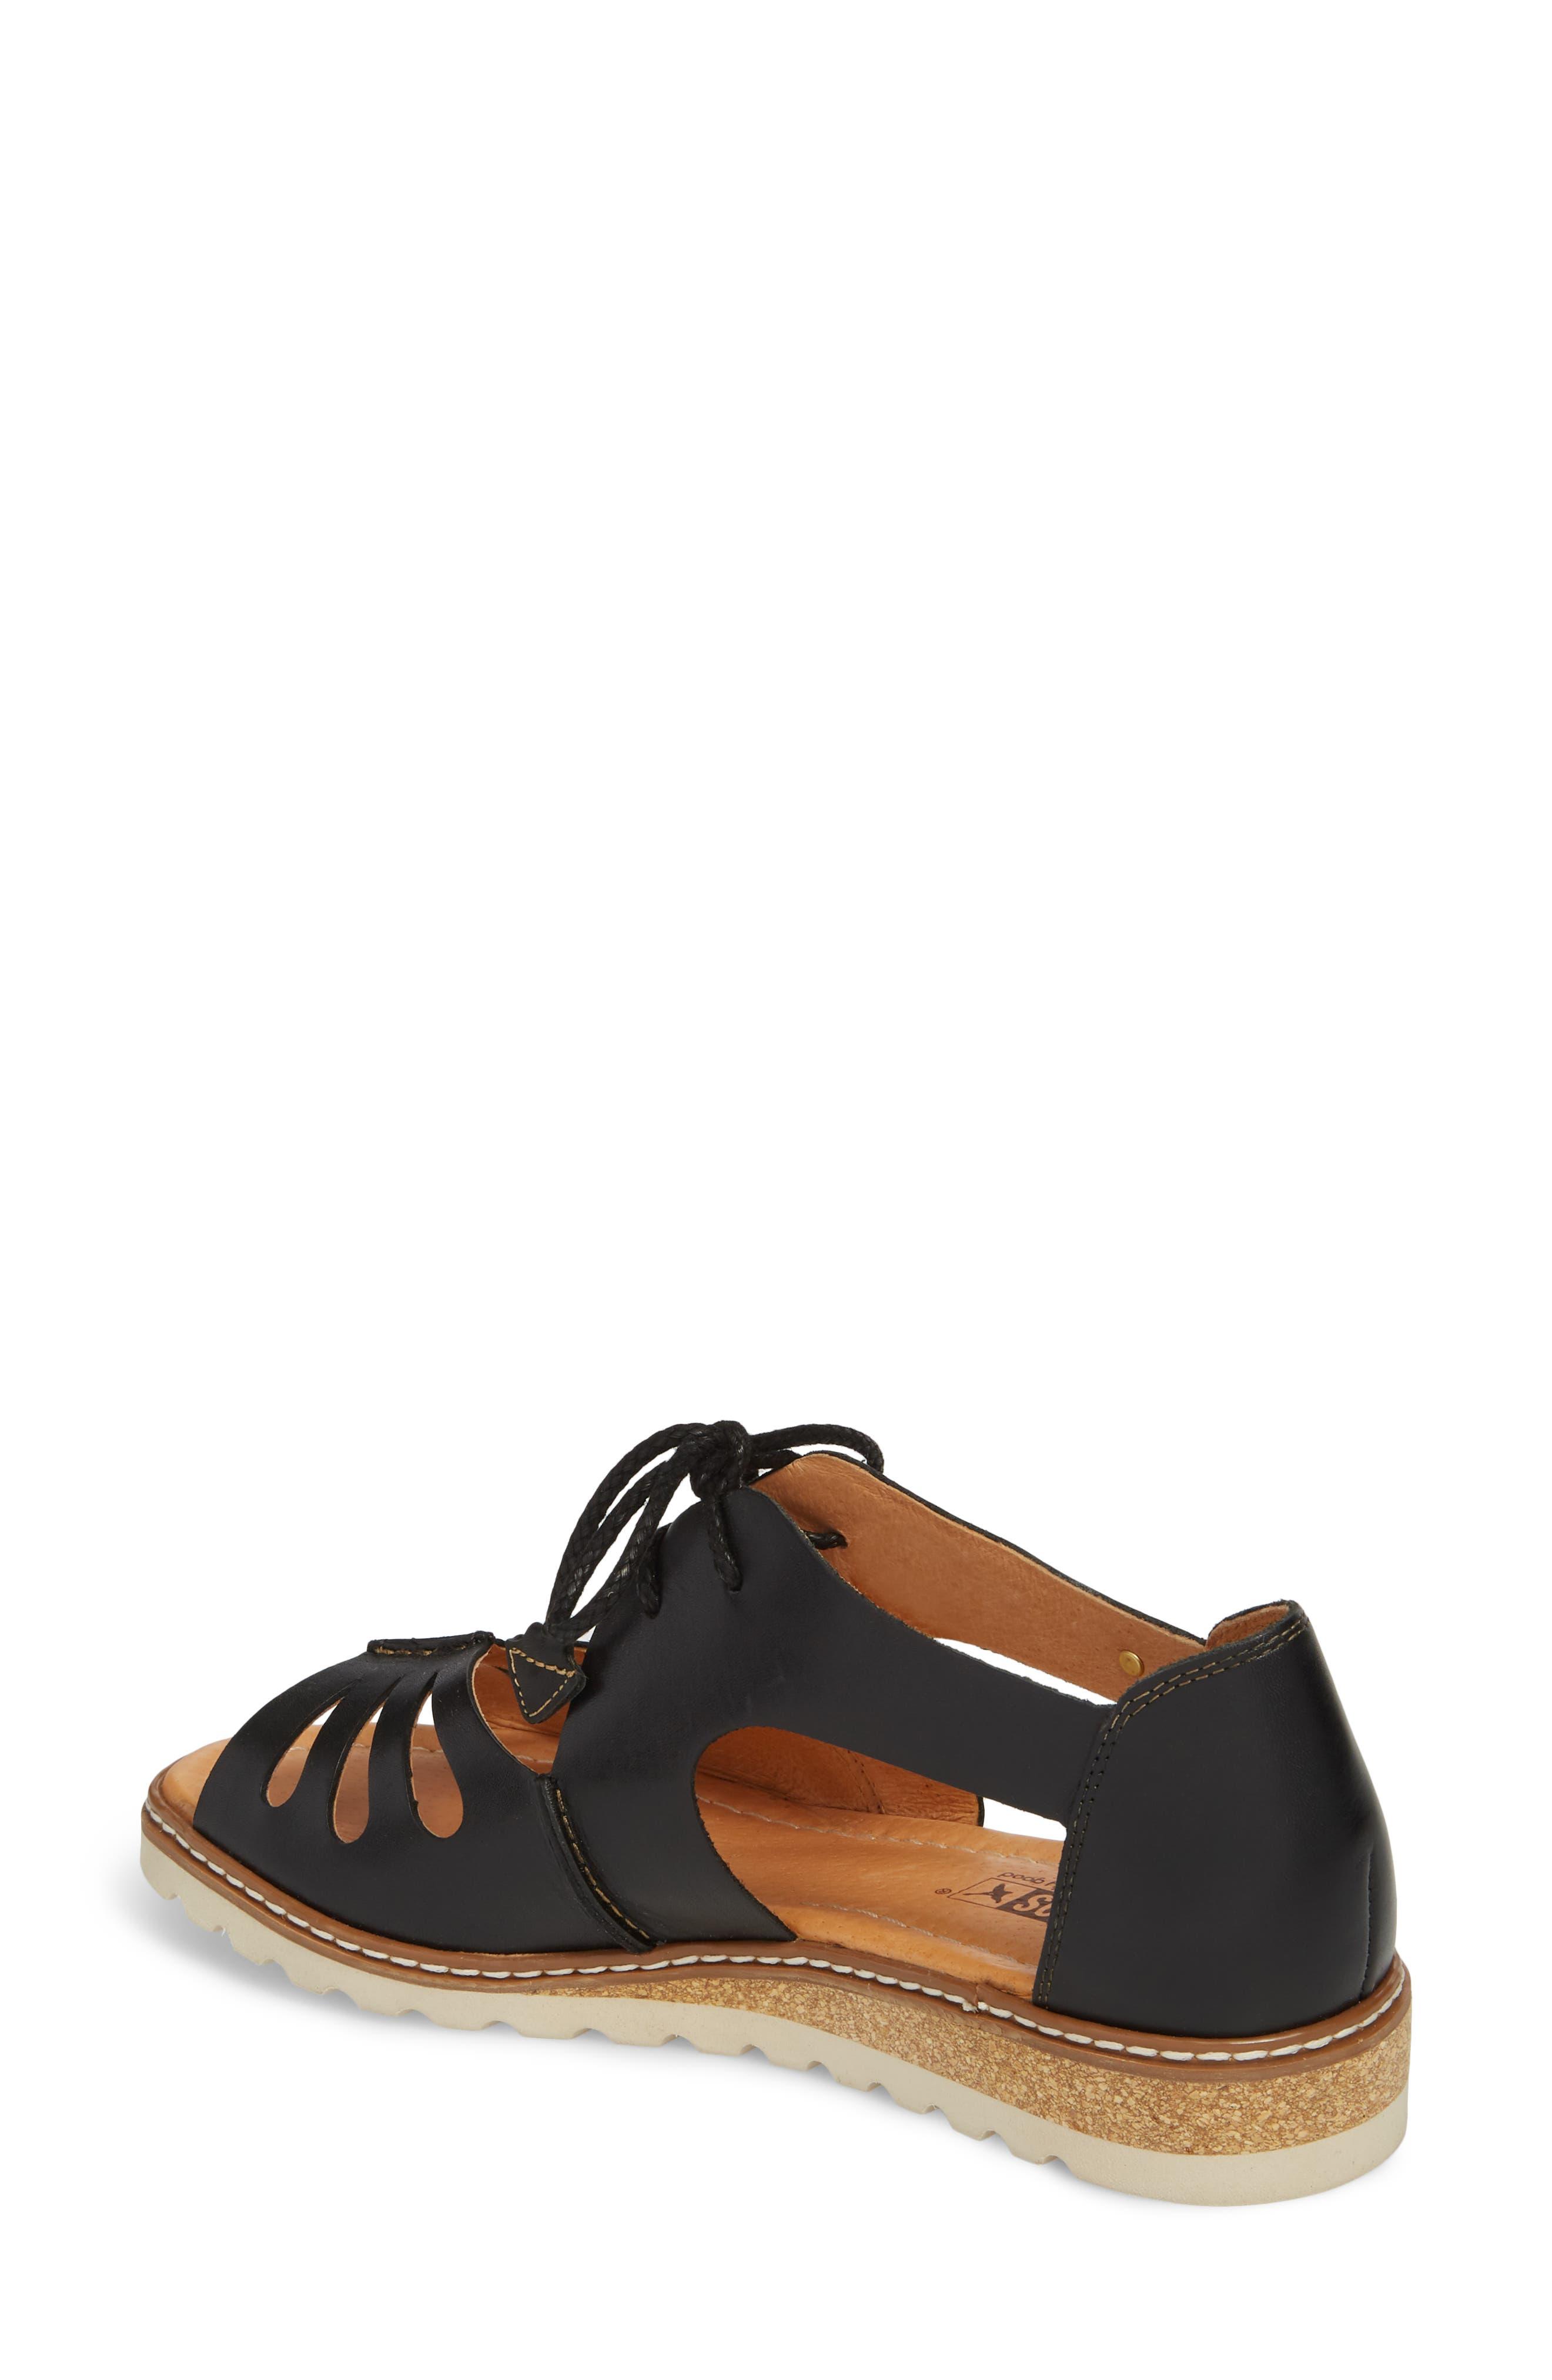 Alcudia Lace-Up Sandal,                             Alternate thumbnail 2, color,                             BLACK LEATHER